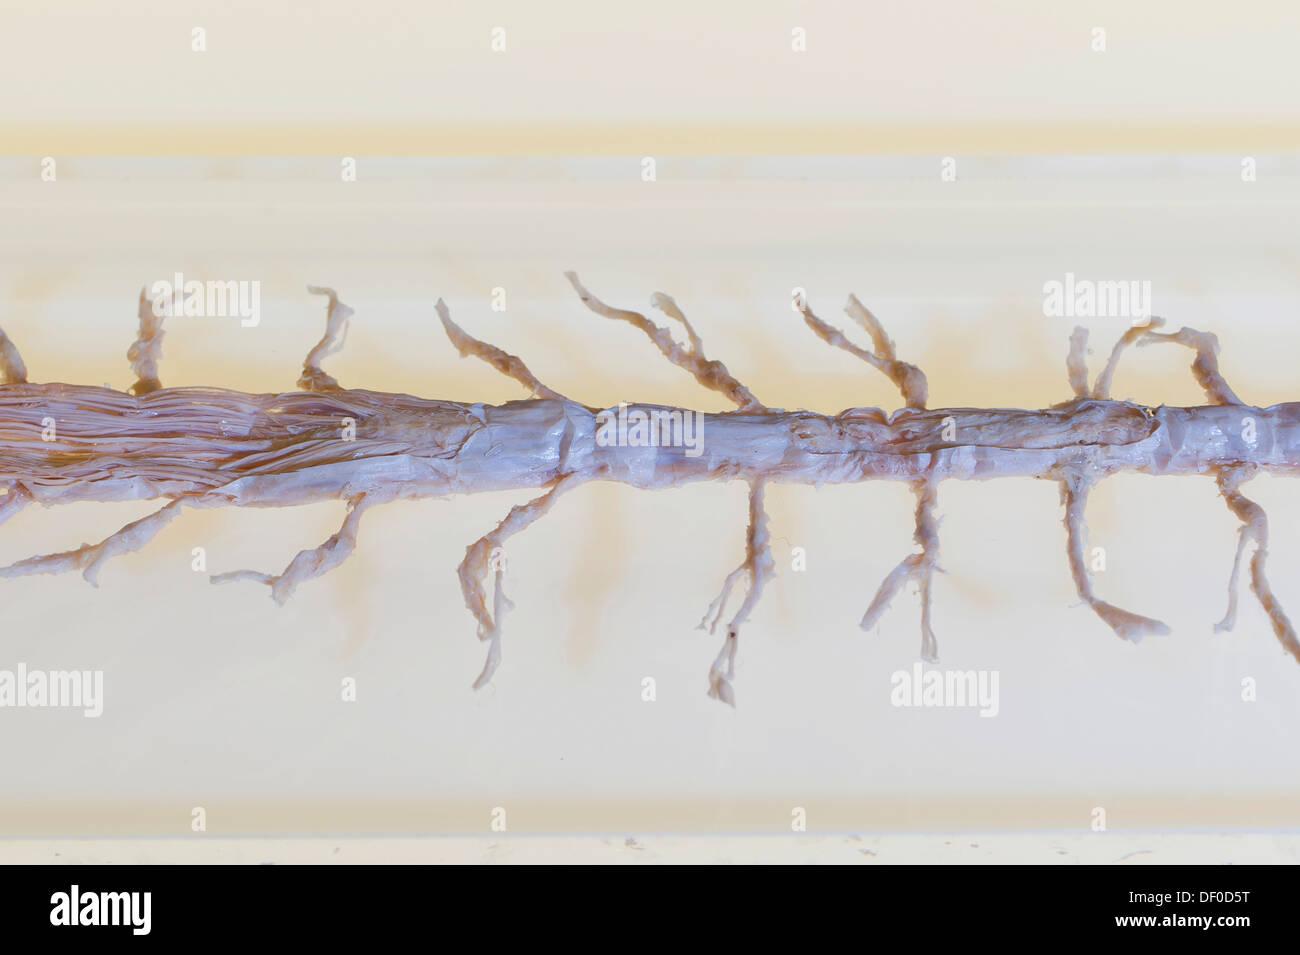 Plastination Exemplar des Rückenmarks Stockfoto, Bild: 60861300 - Alamy